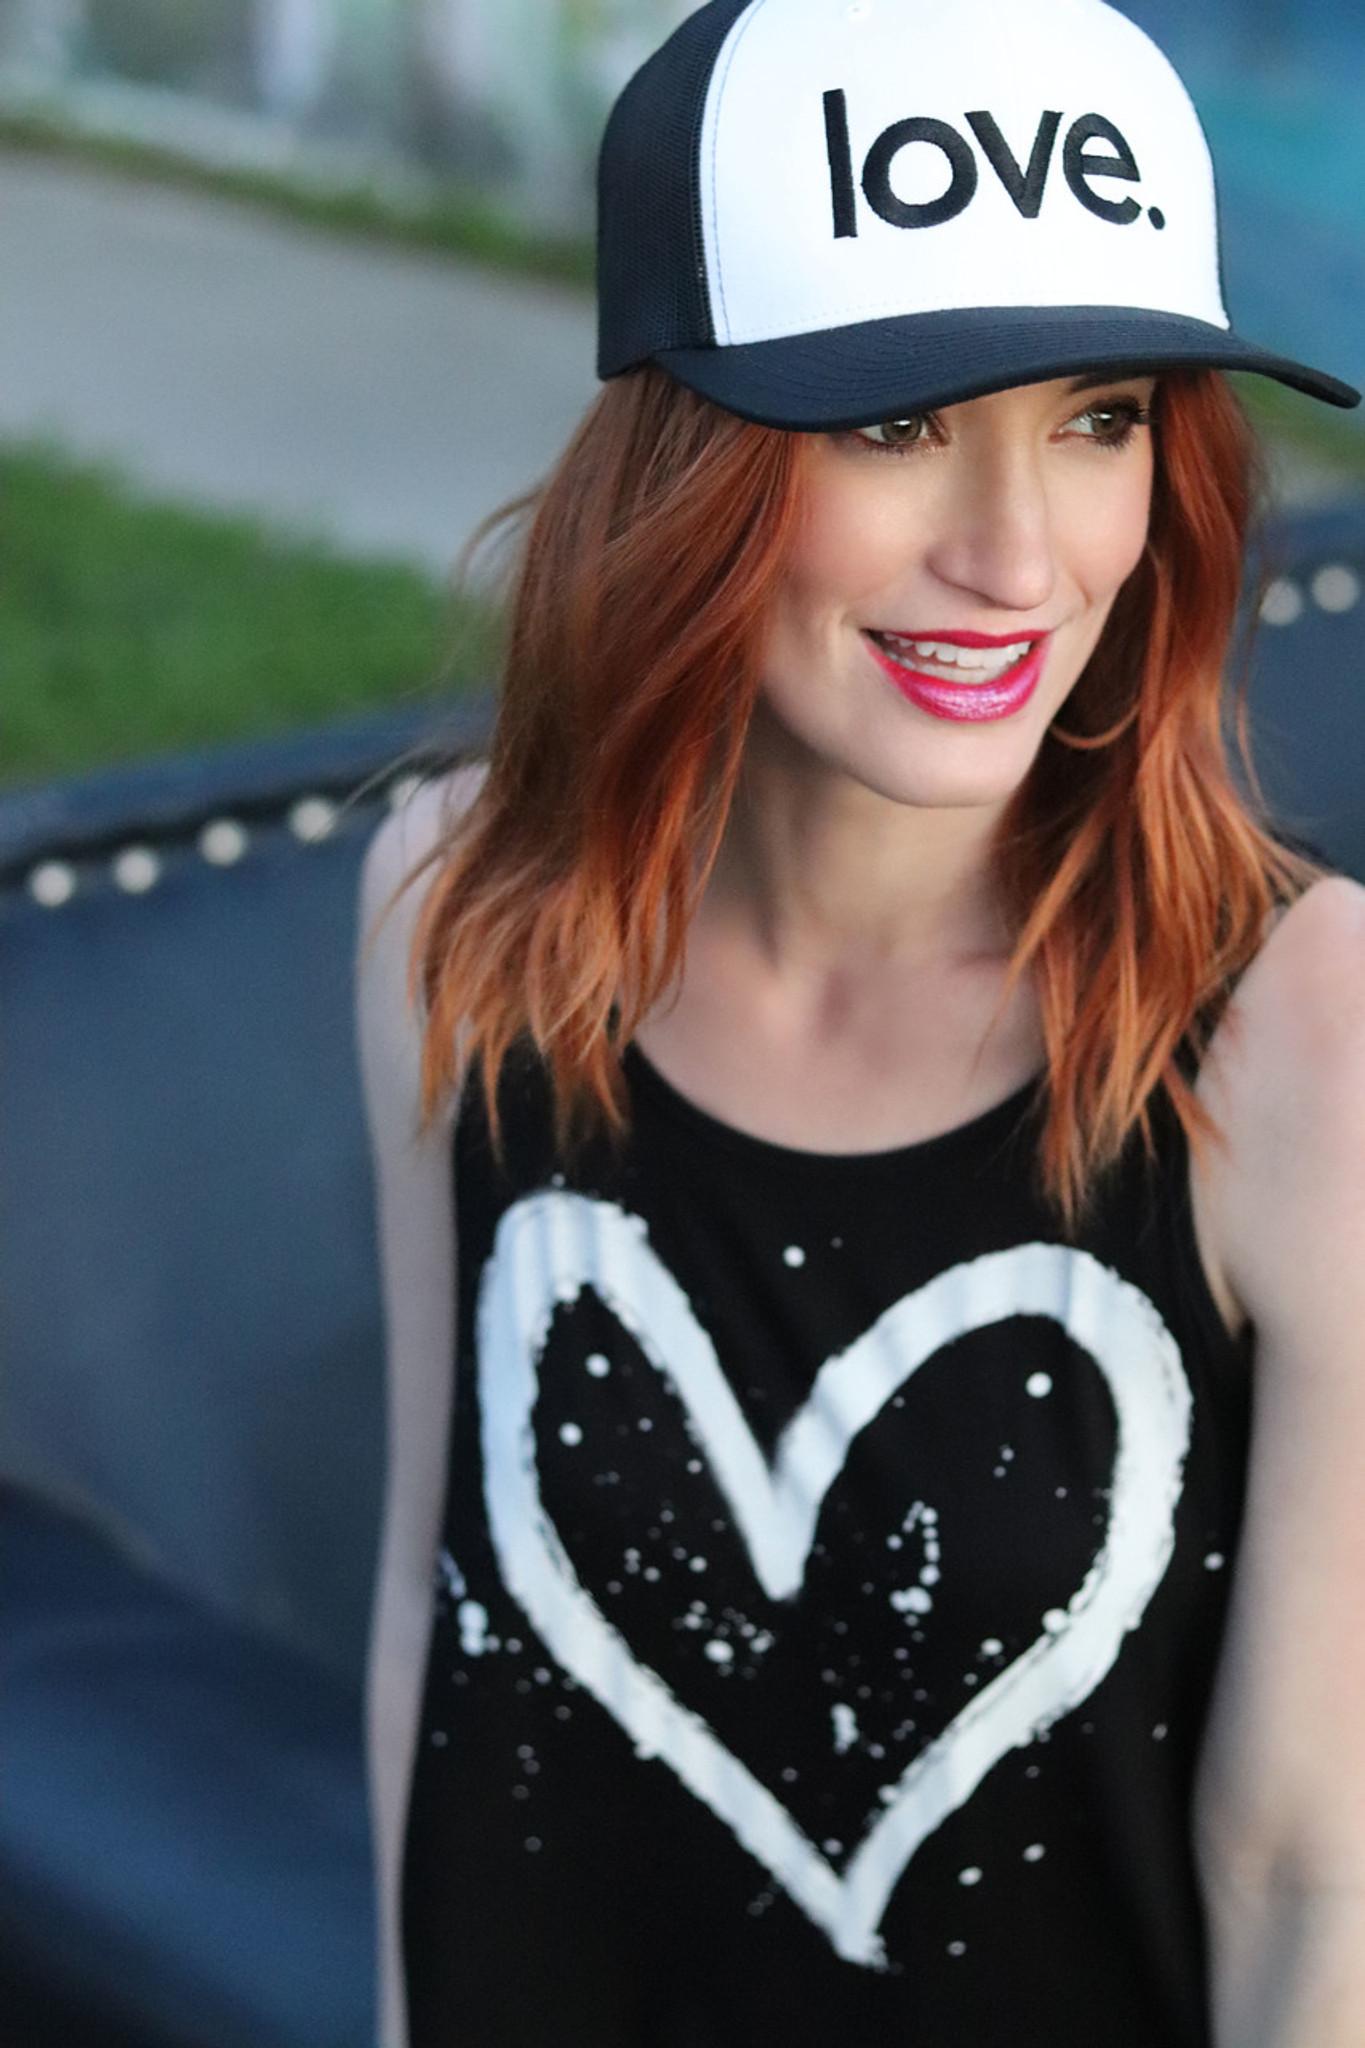 LOVE. EMBROIDERED TRUCKER HAT BLACK ON WHITE